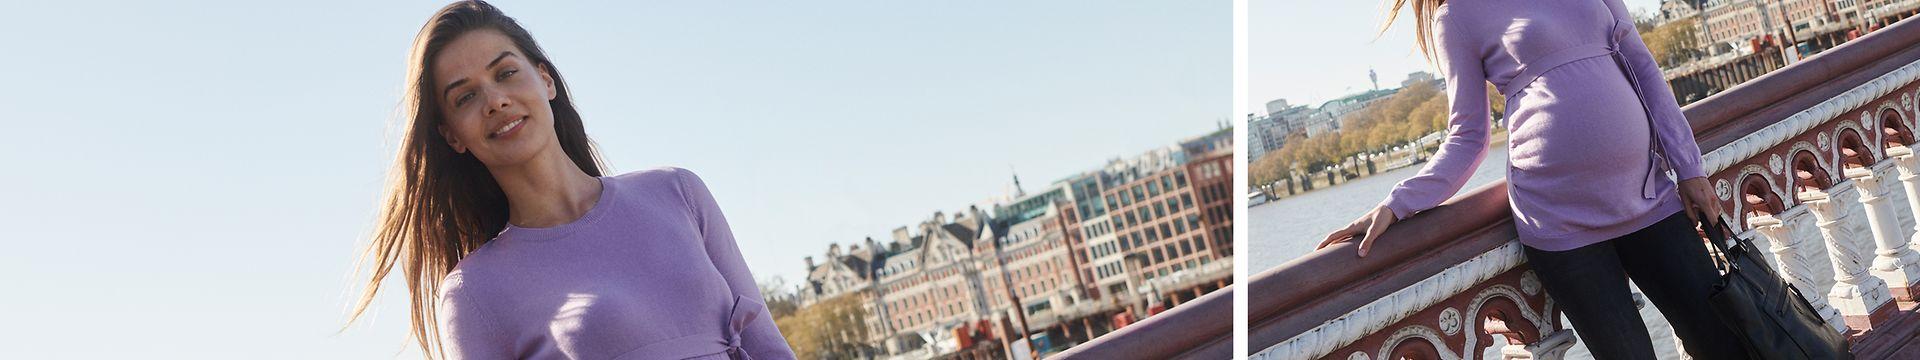 412021- women - startpage- pov - umstandsmode - tshirts tops - IMG